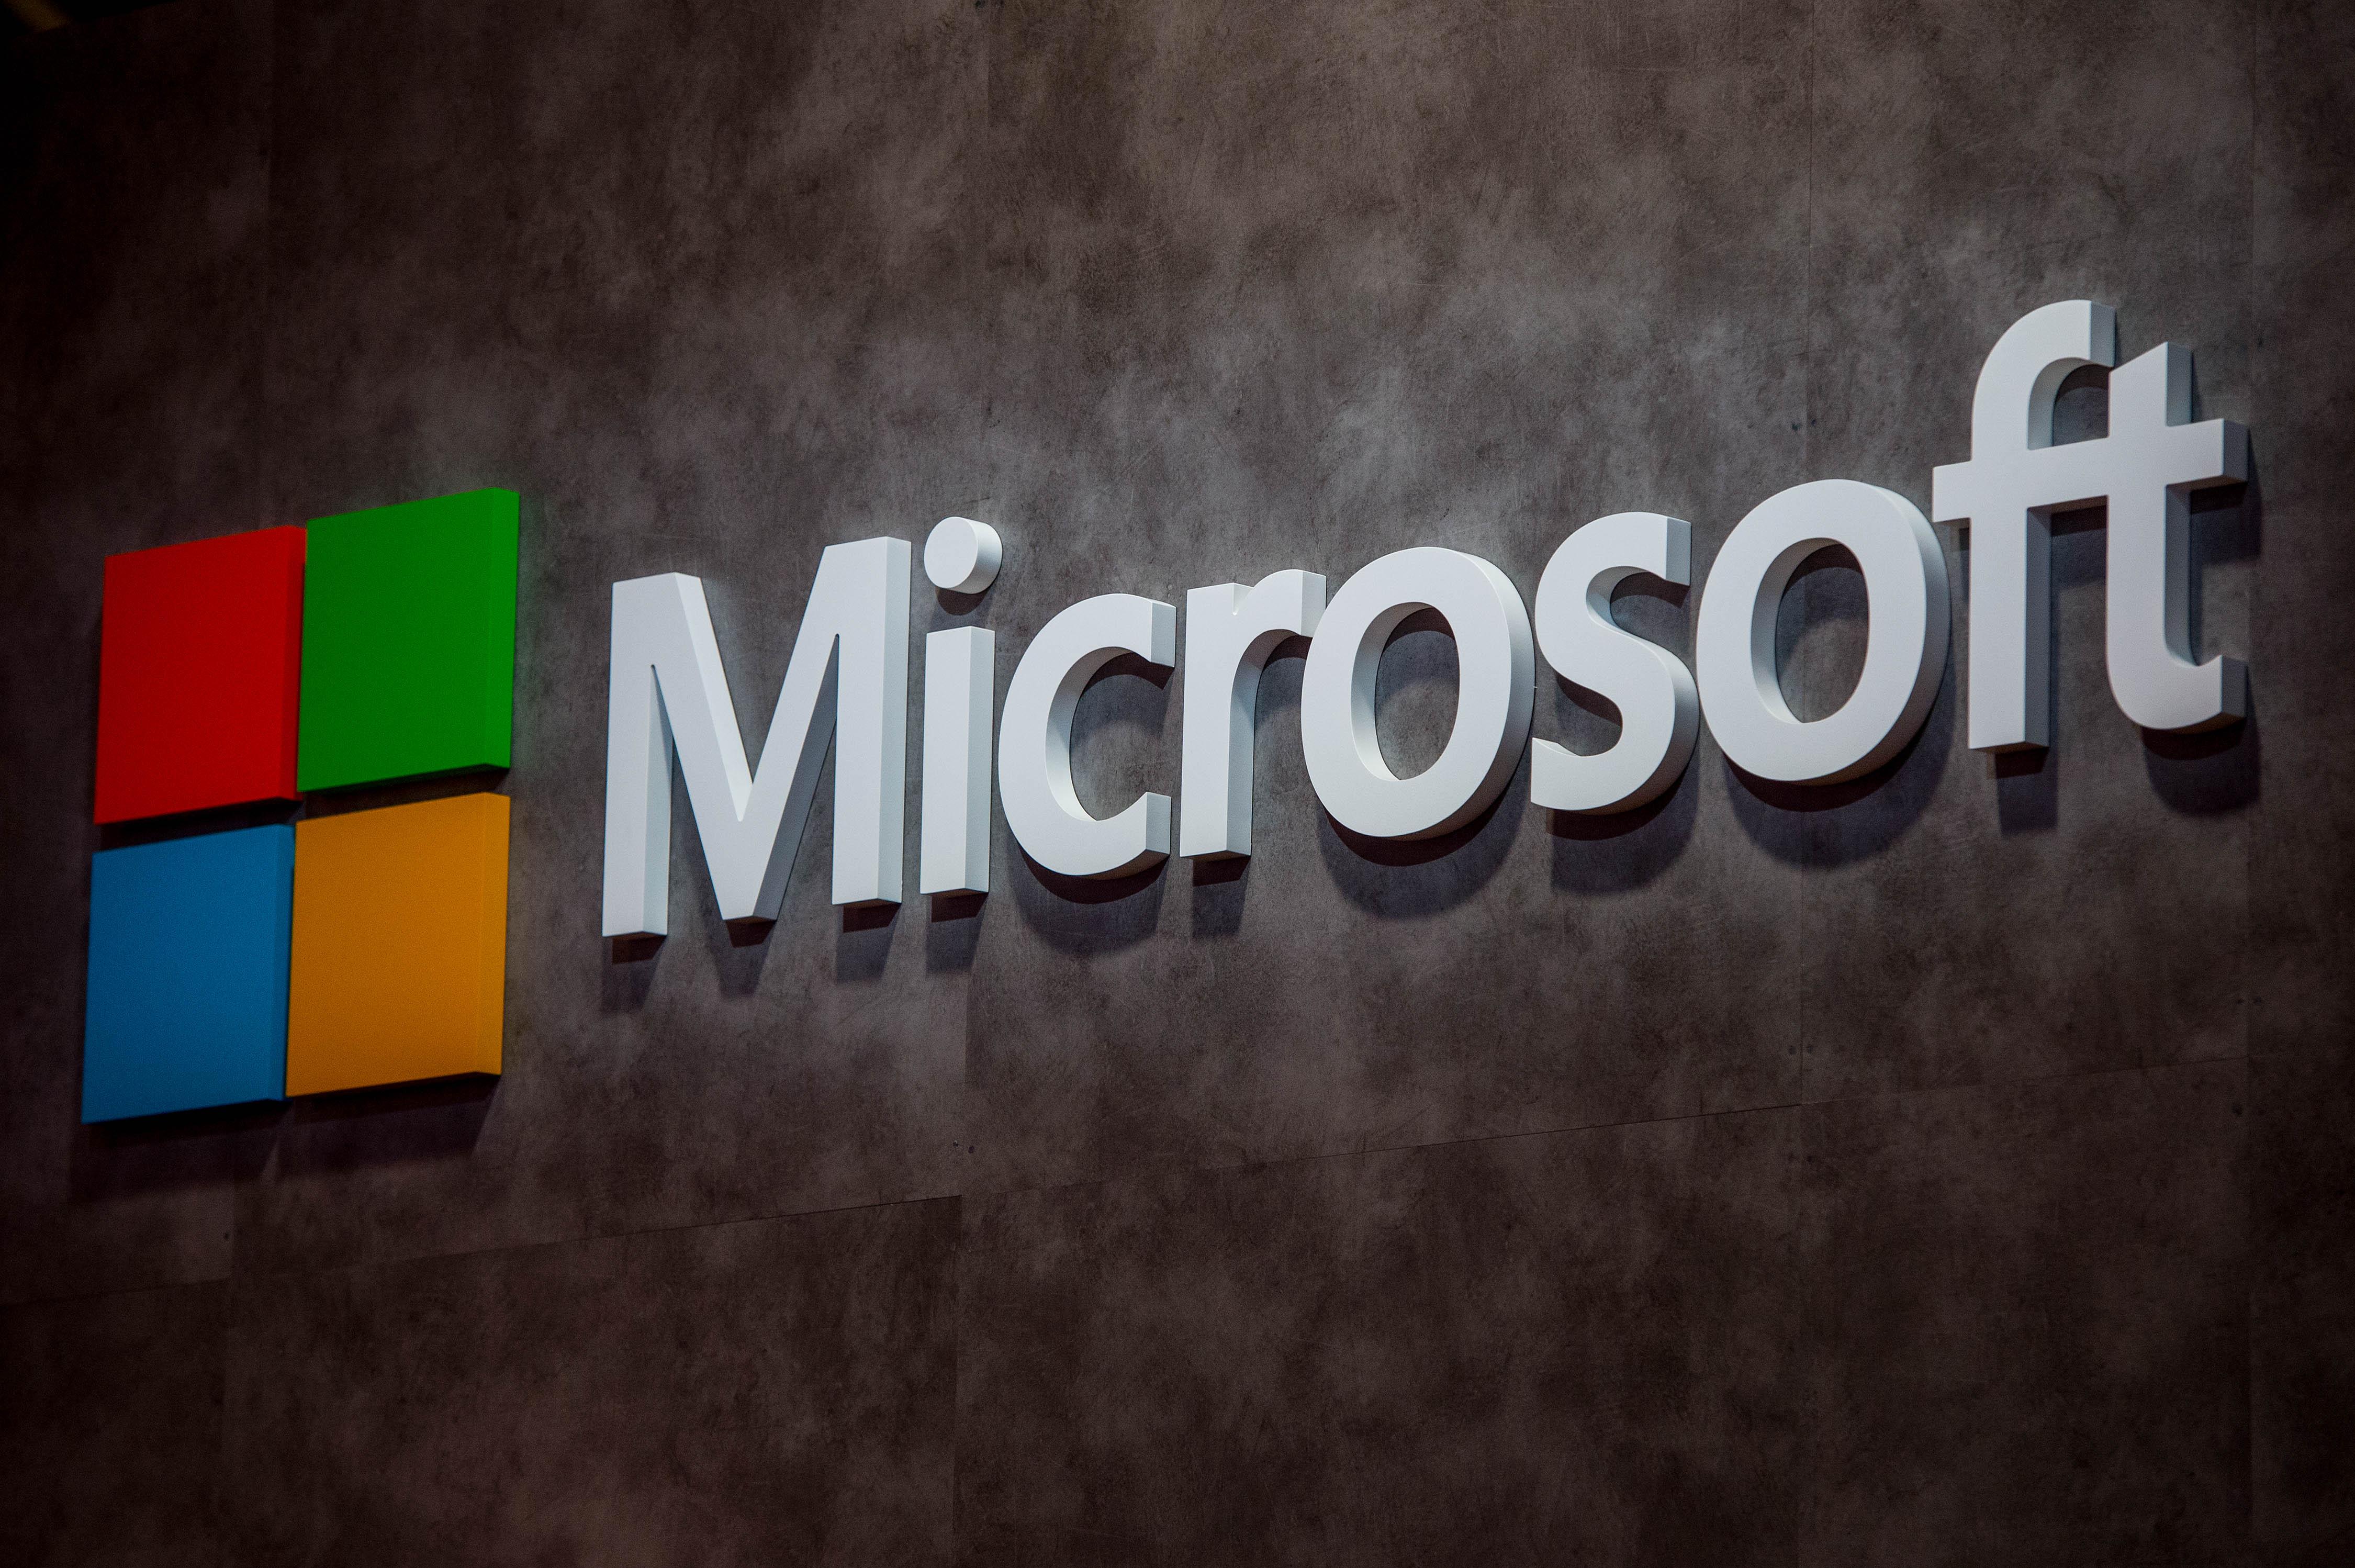 Прежний рабочий Microsoft поведал, почему провалился Windows Phone